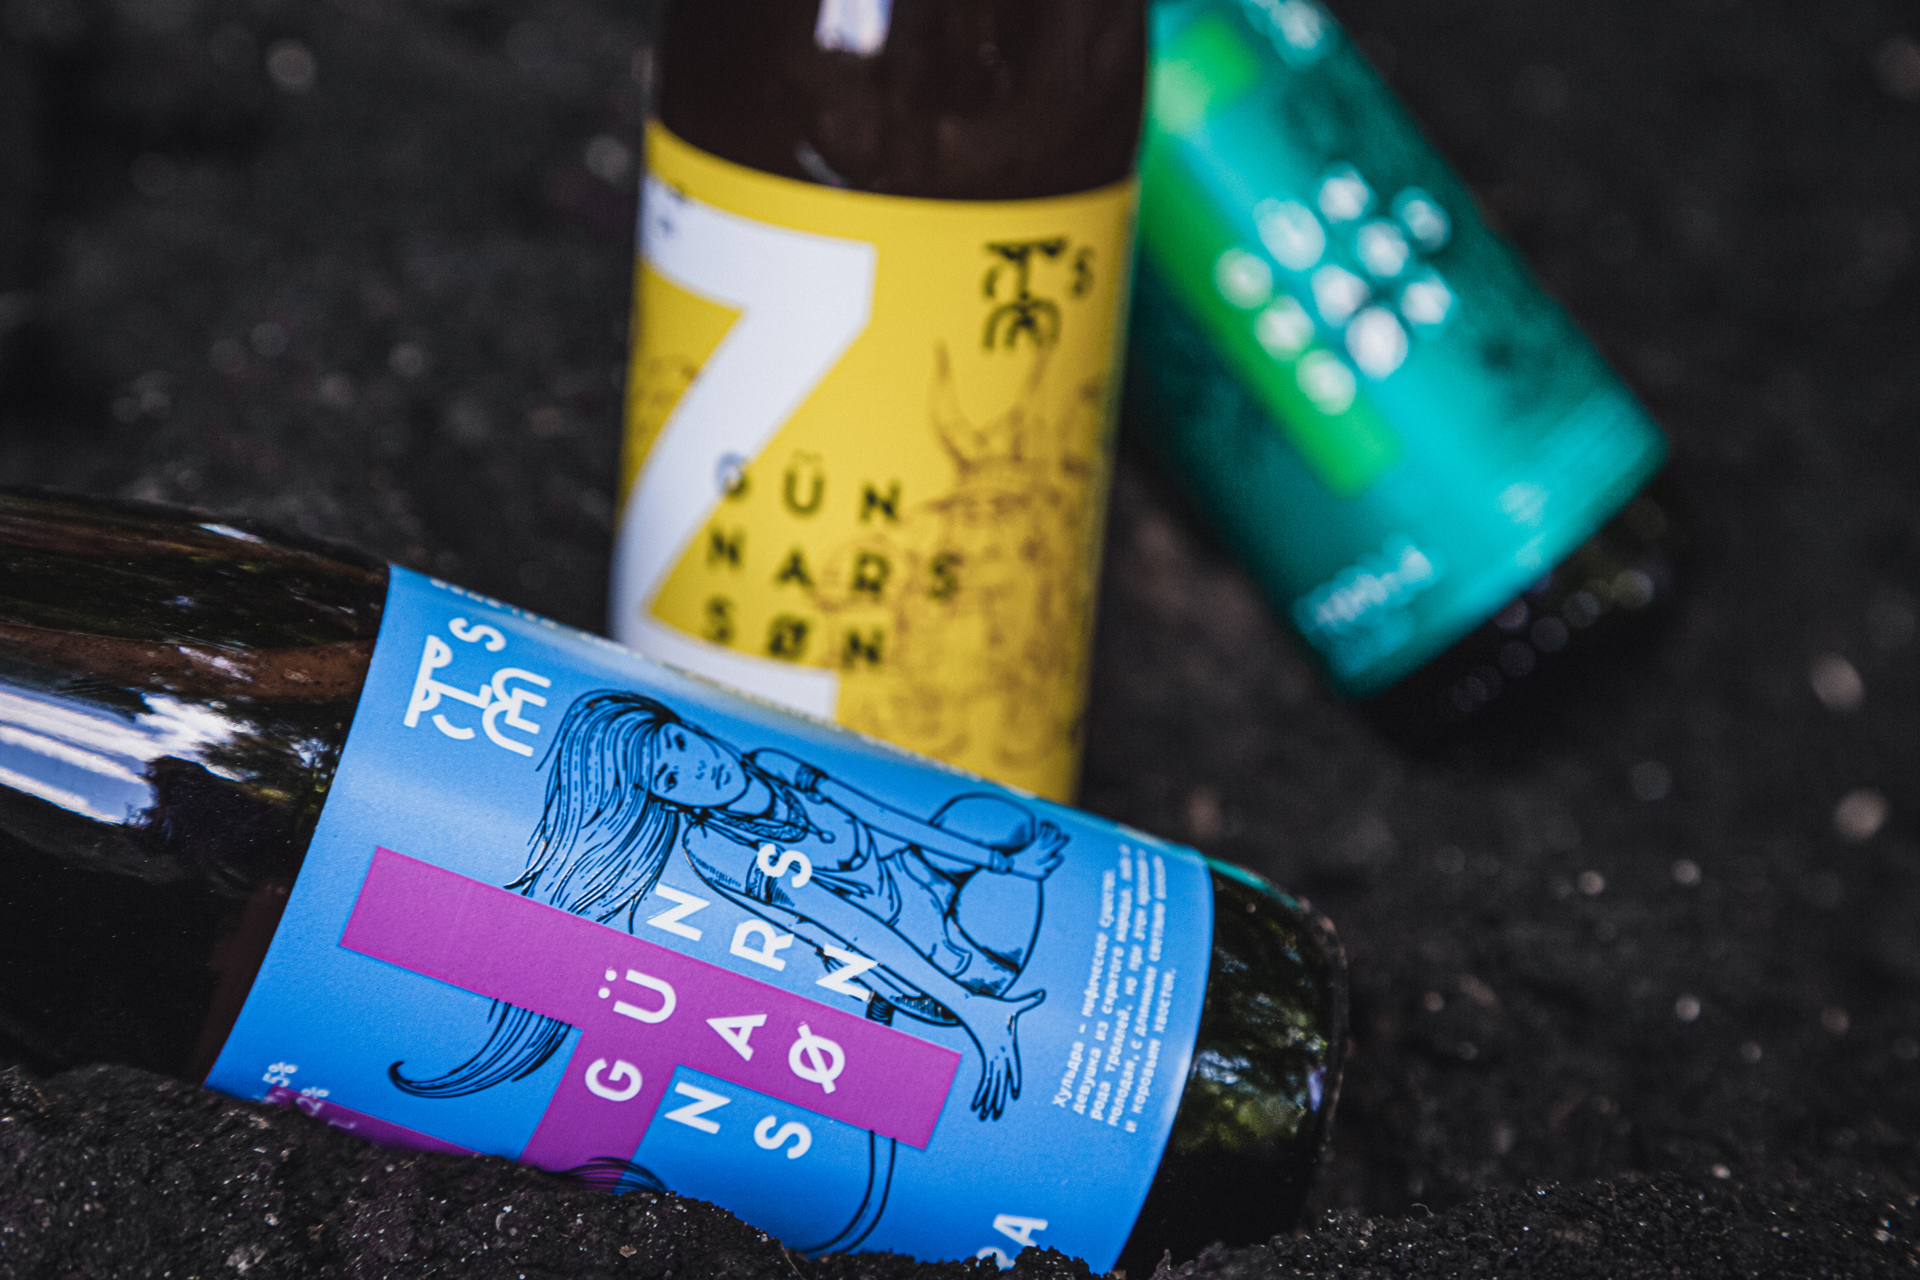 Gunnarson Rebranding Trade Mark and Labels Design by Unblvbl Branding Agency